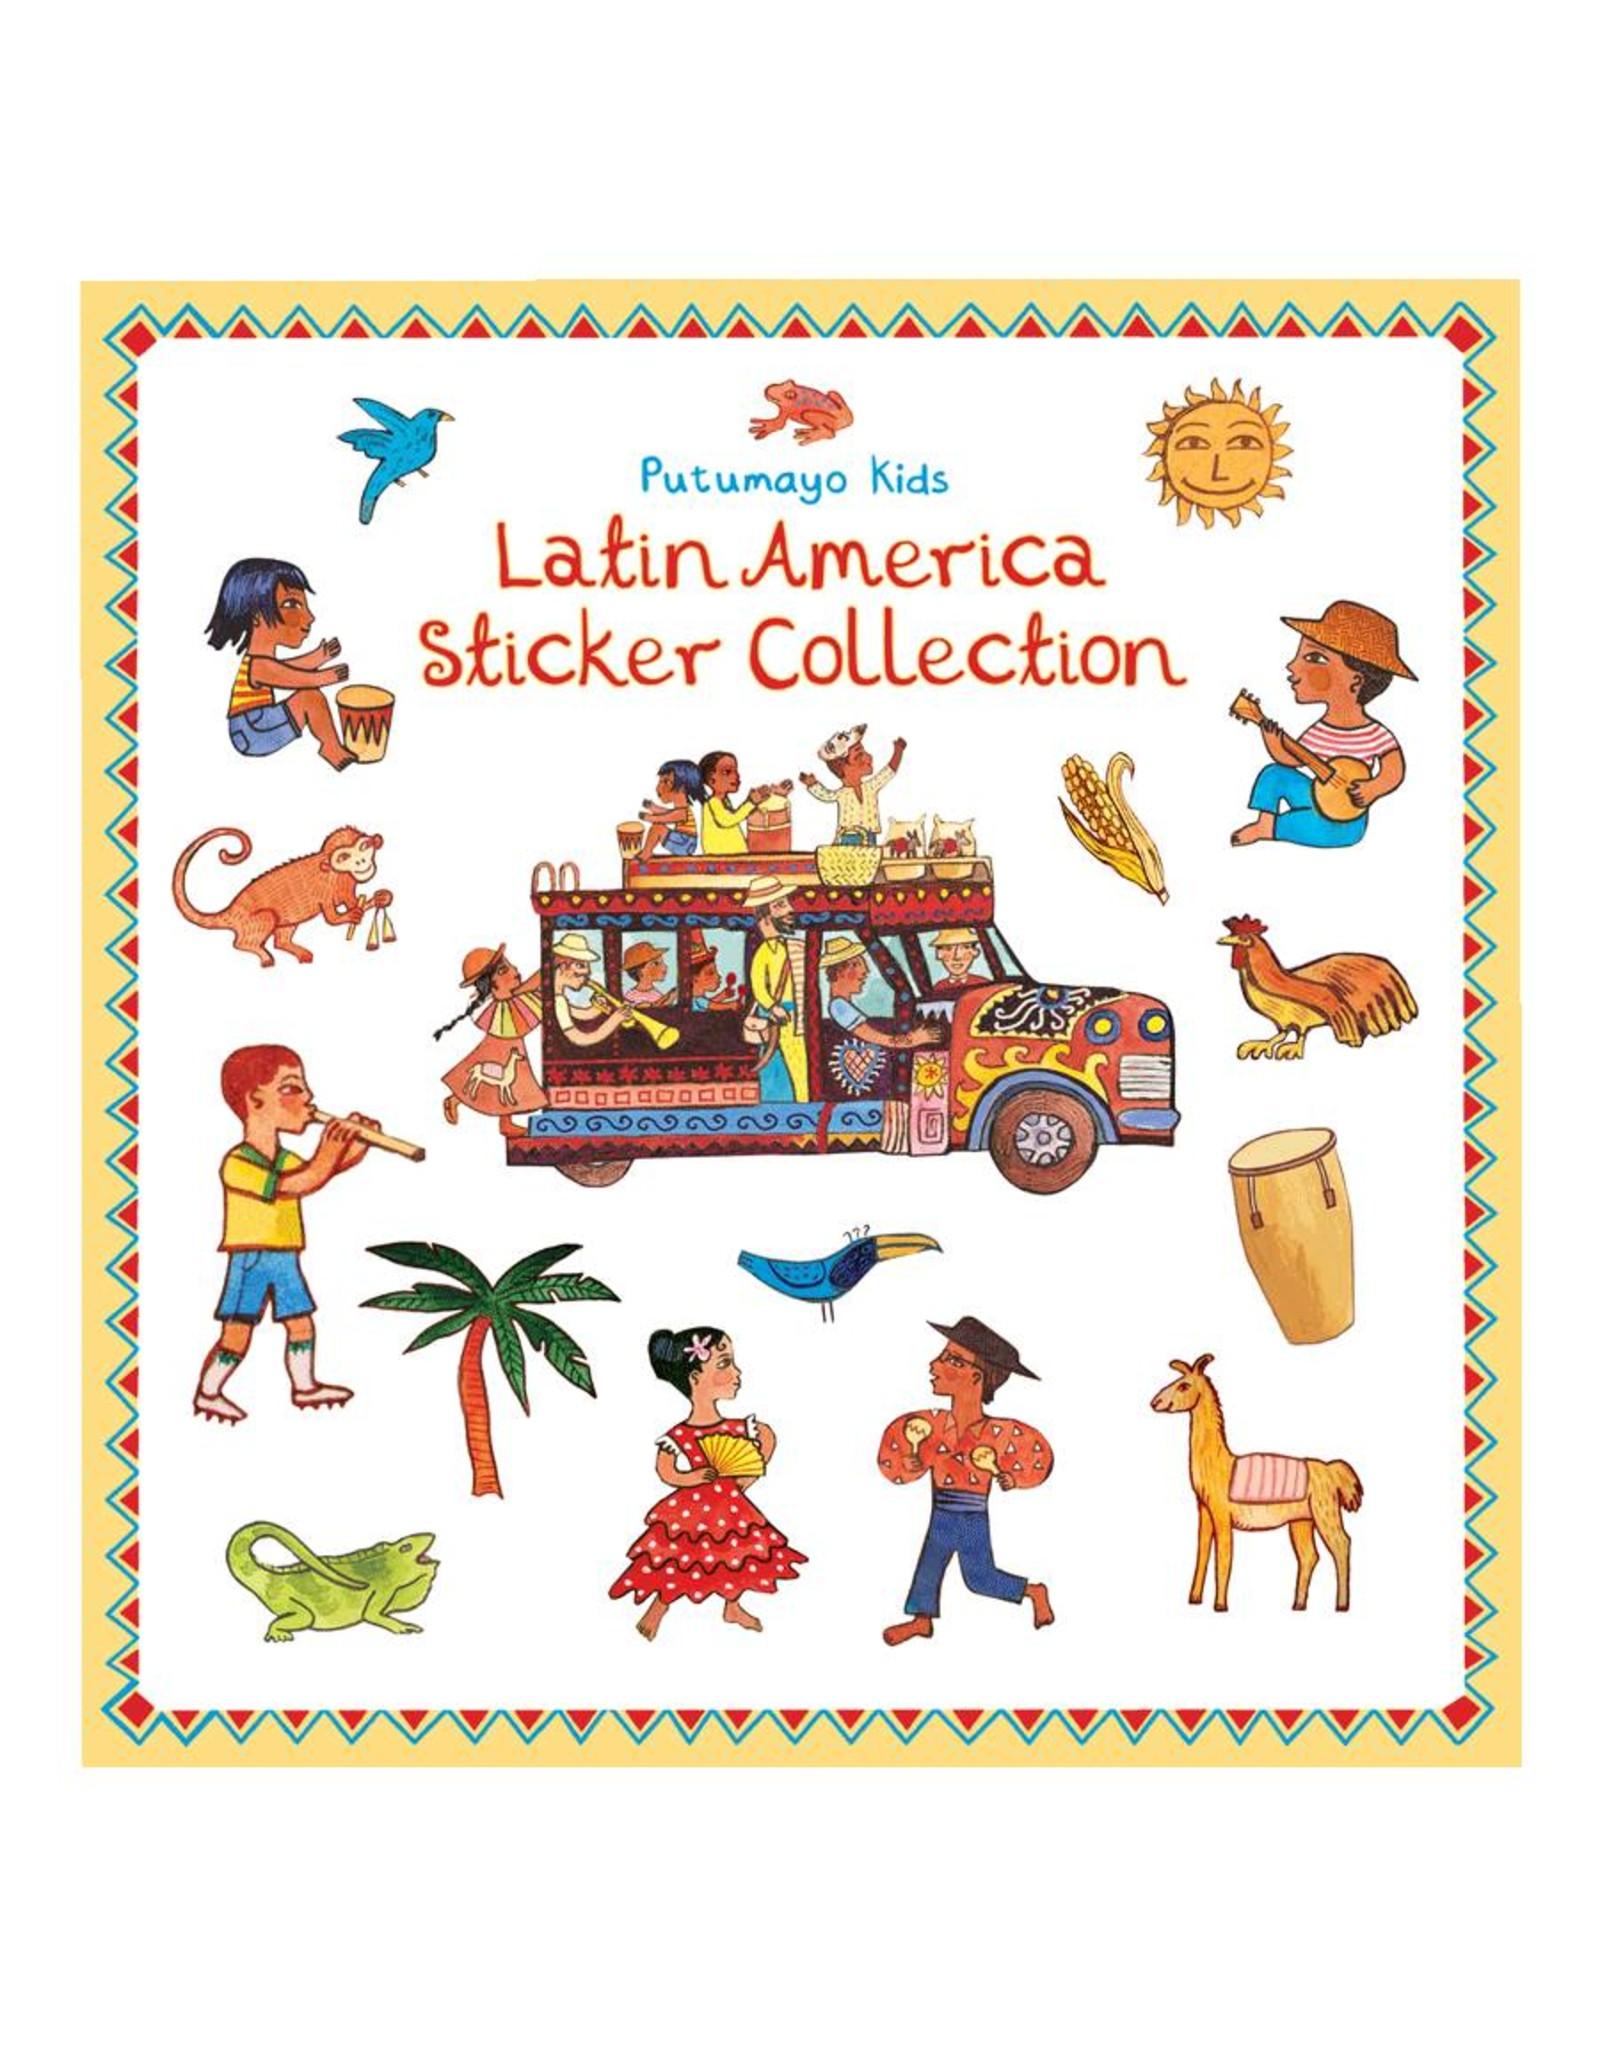 Putumayo Kids sticker book Latin America